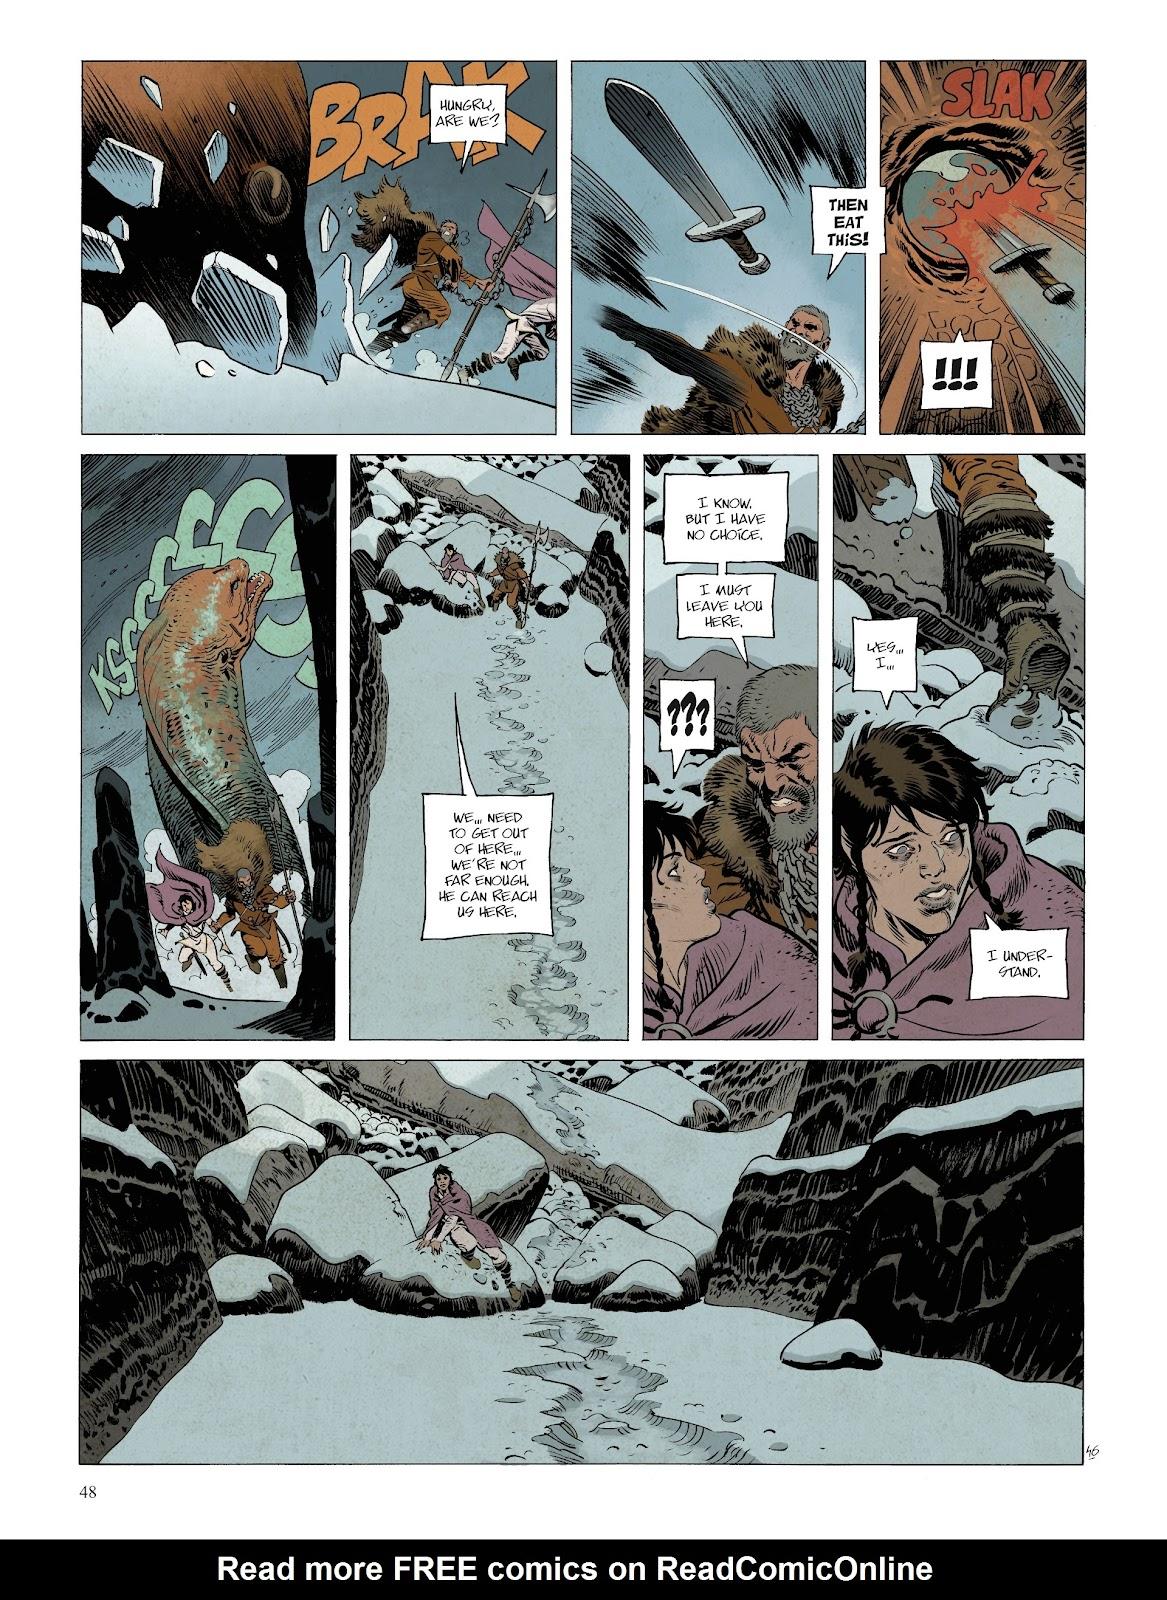 Read online Asgard comic -  Issue #2 - 50